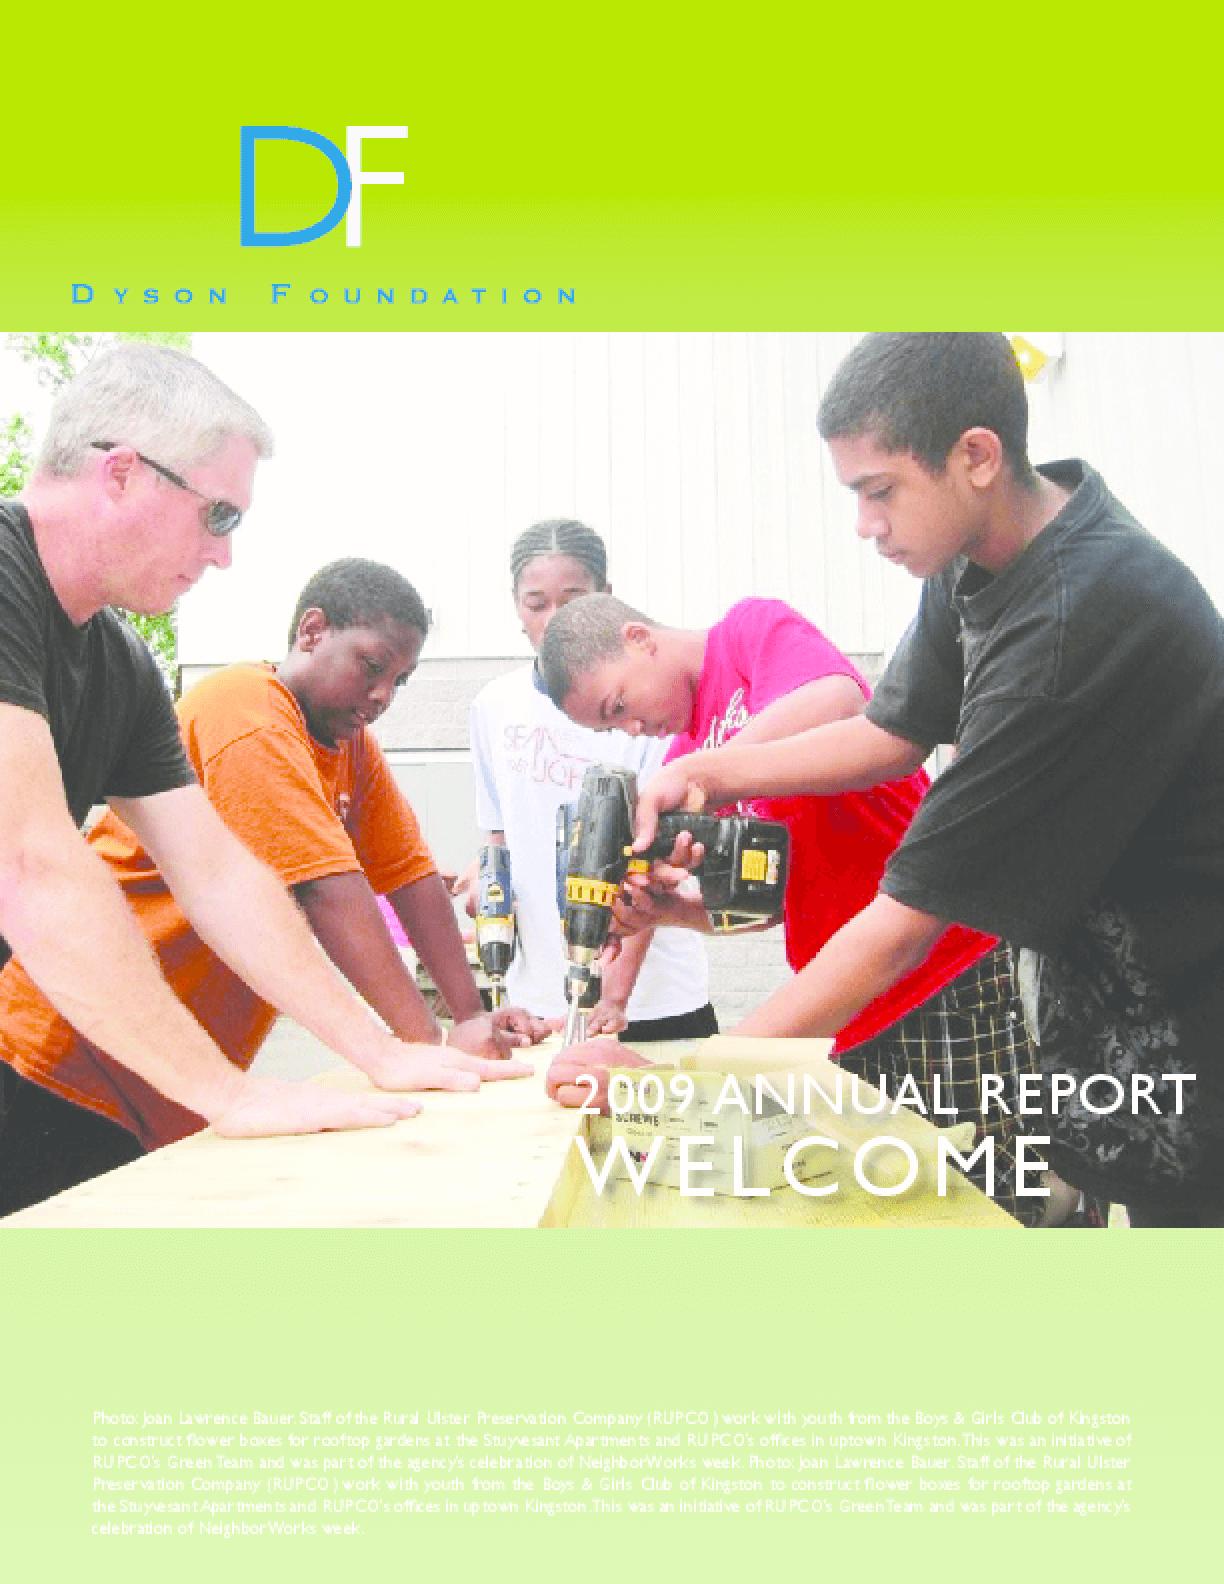 Dyson Foundation - 2009 Annual Report